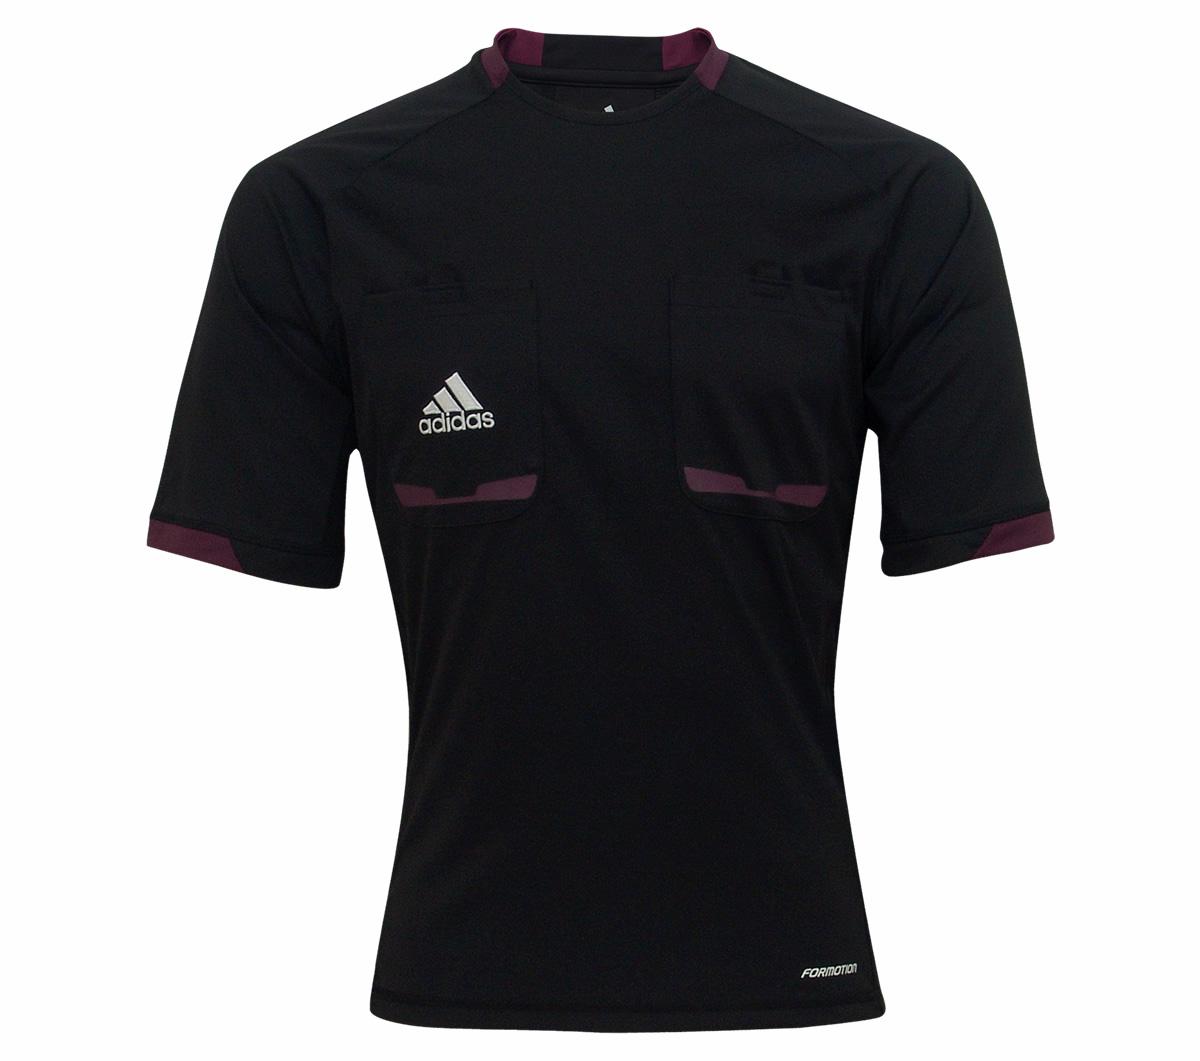 864fc46797128 Camisa Árbitro Adidas Preta Camisa Árbitro Adidas Preta ...